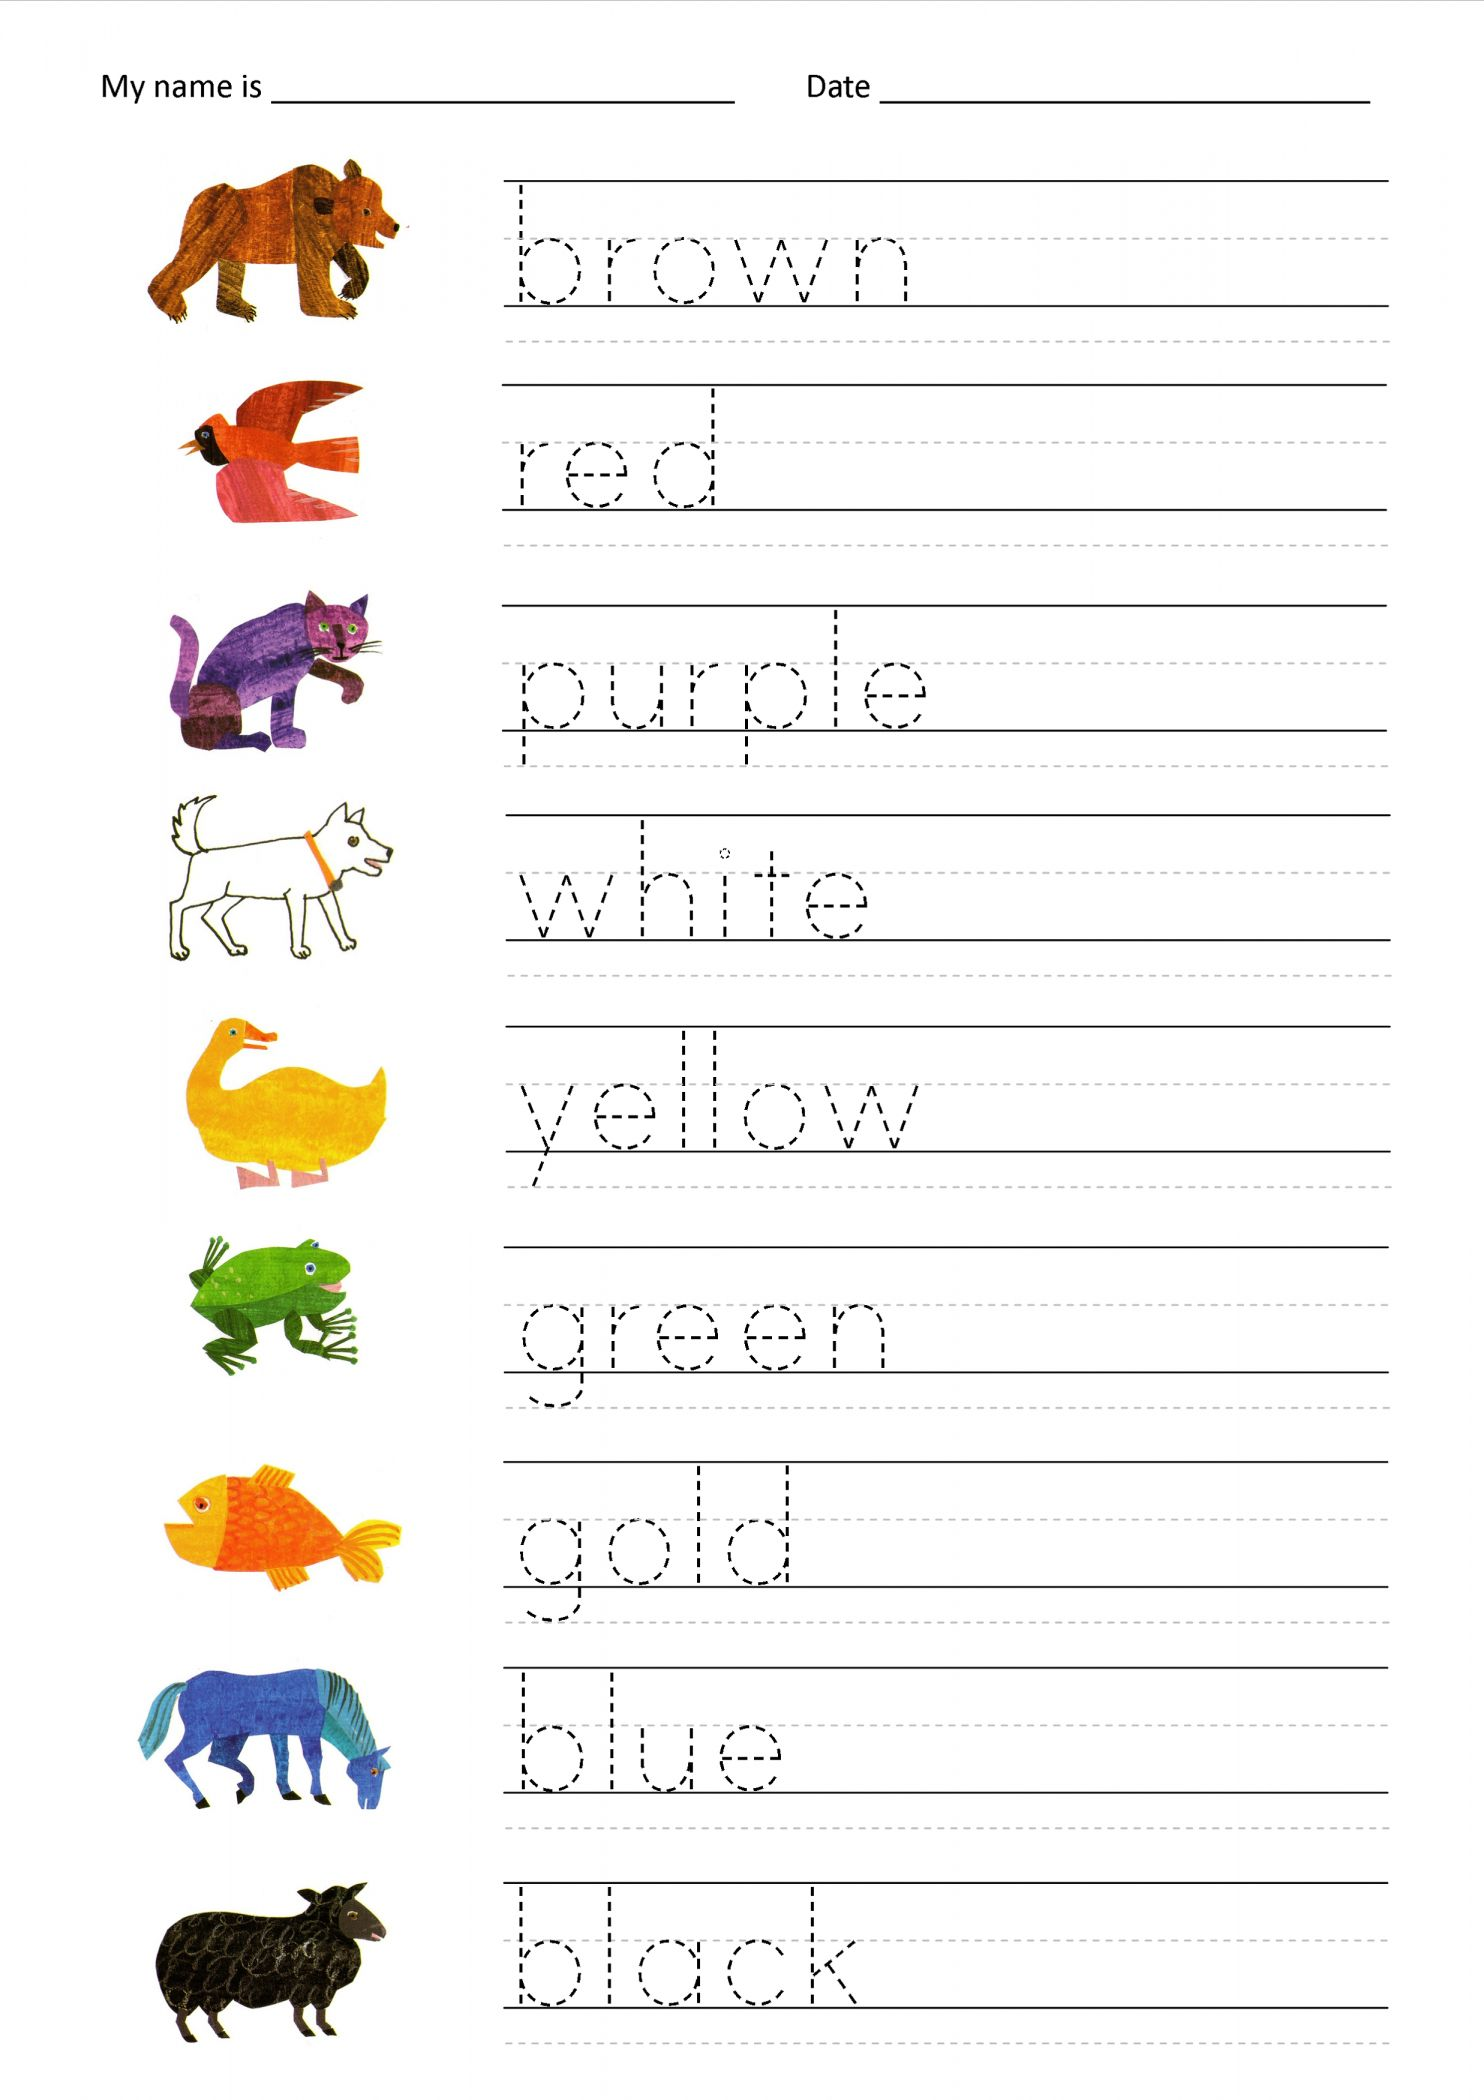 9 Name Worksheet For Preschool Free Preschool Worksheets Preschool Writing Tracing Worksheets Preschool [ 2100 x 1484 Pixel ]